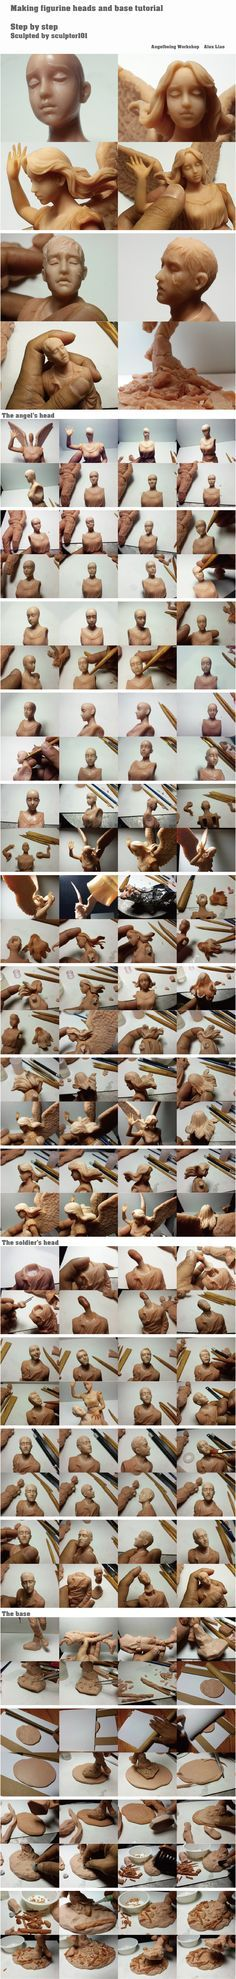 Figurine WIP\ tutorial part 6 heads + base final by sculptor101